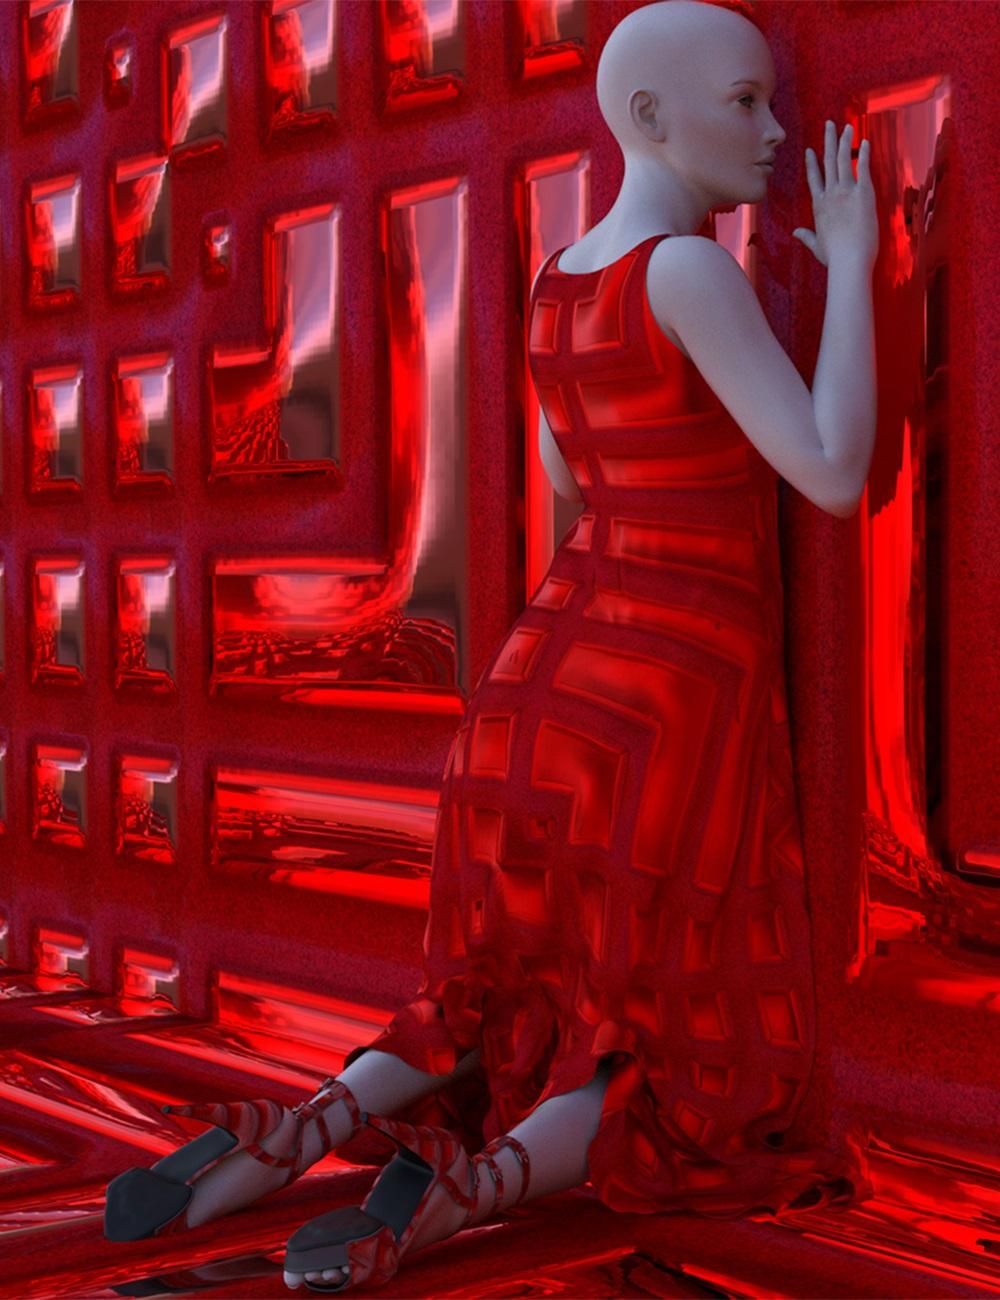 Japanese Kirikane Iray Shaders by: A_Waka, 3D Models by Daz 3D